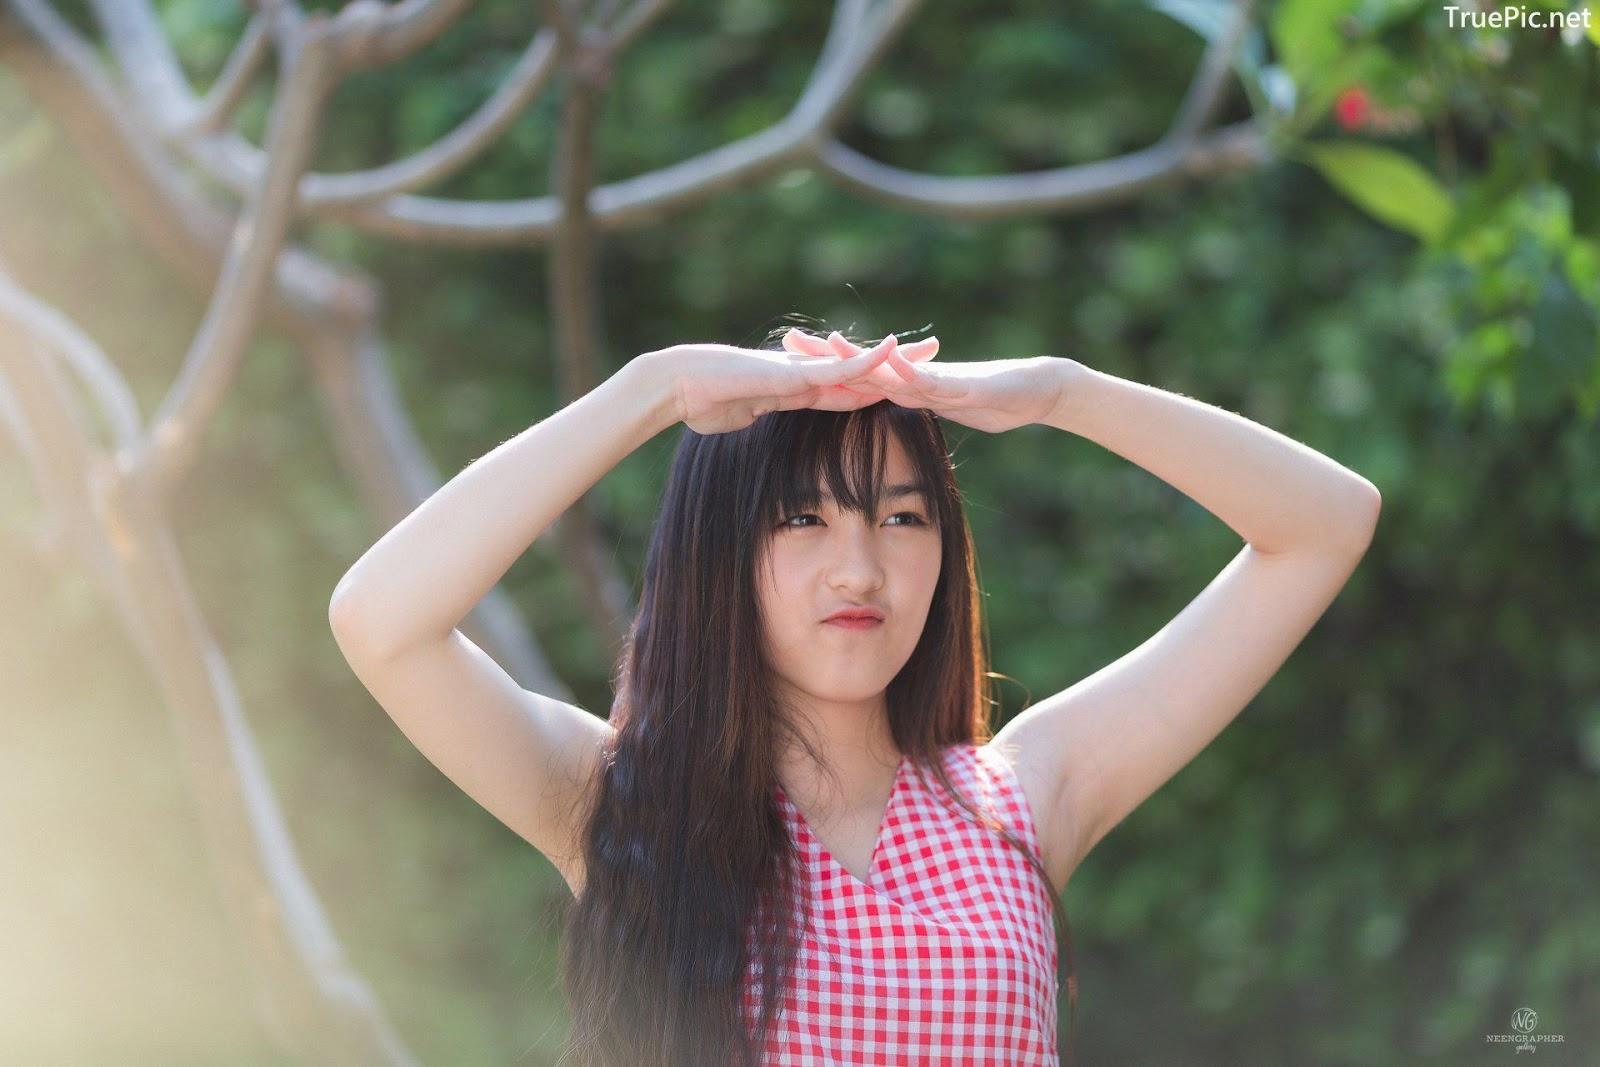 Image-Thailand-Cute-Model-Emma-Panisara–Album-Emma-Bright-Sunday-TruePic.net- Picture-26